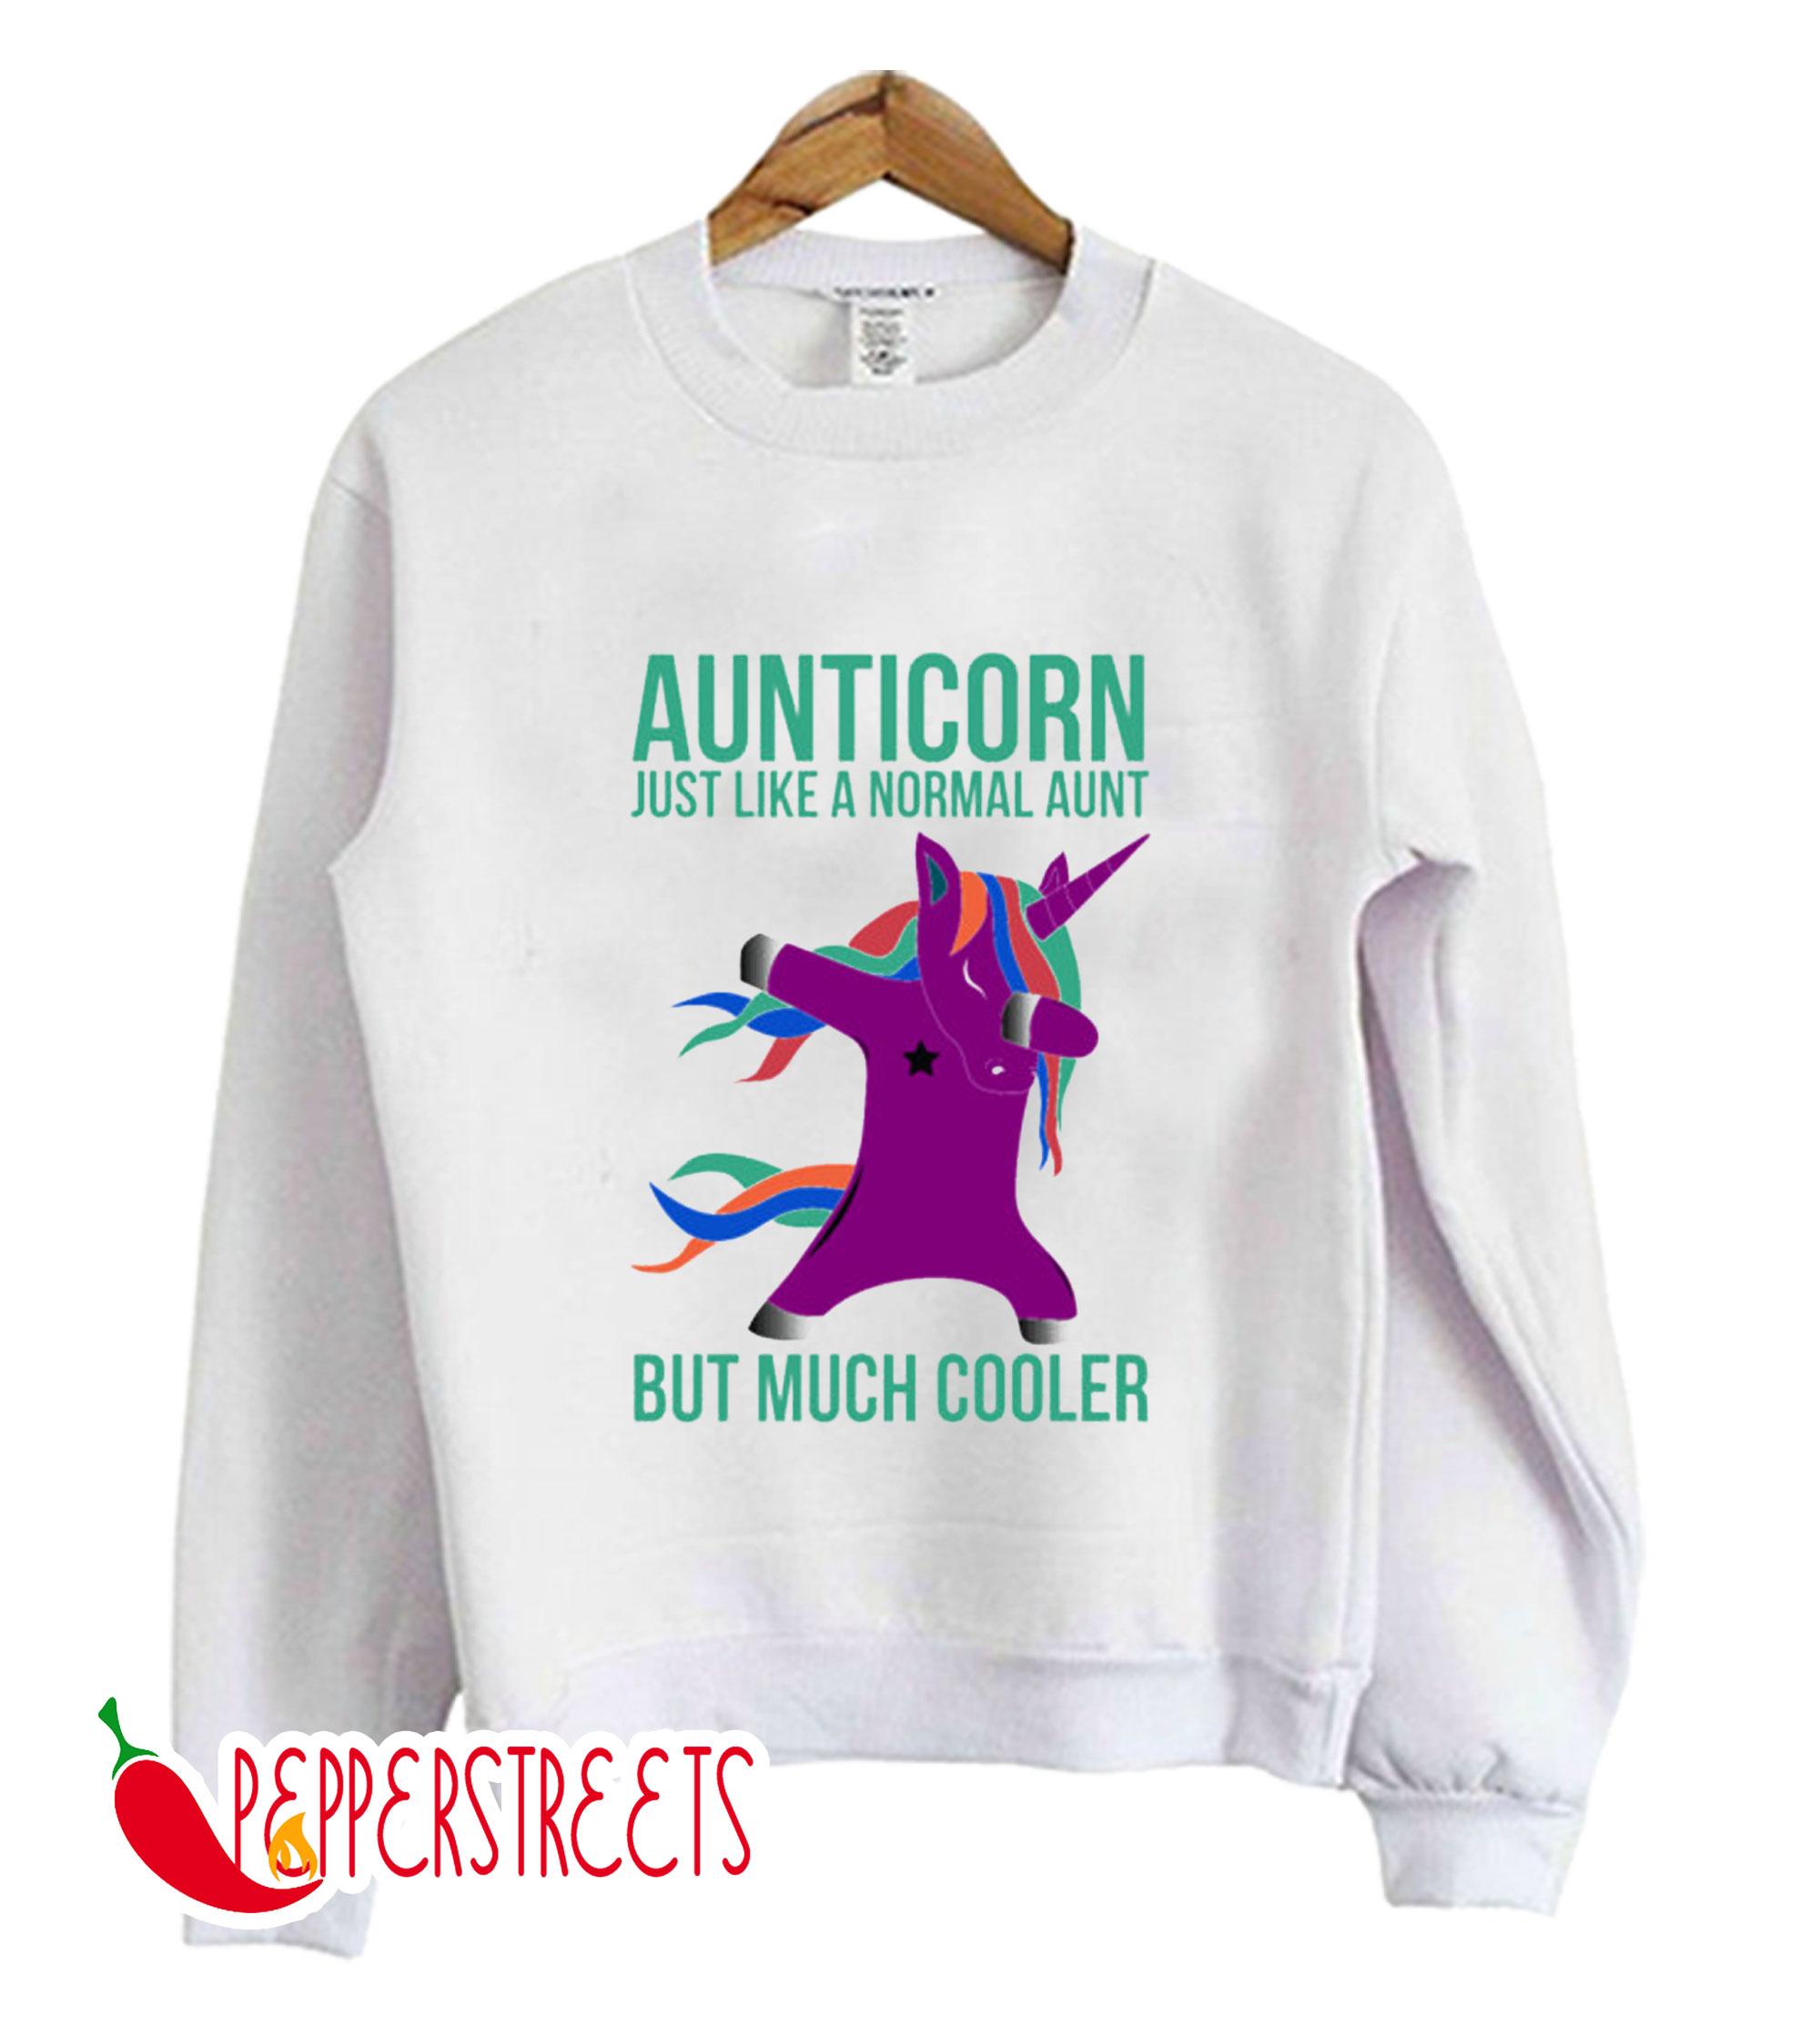 Aunticorn Unicorn Gift For Cool Aunt Sweatshirt